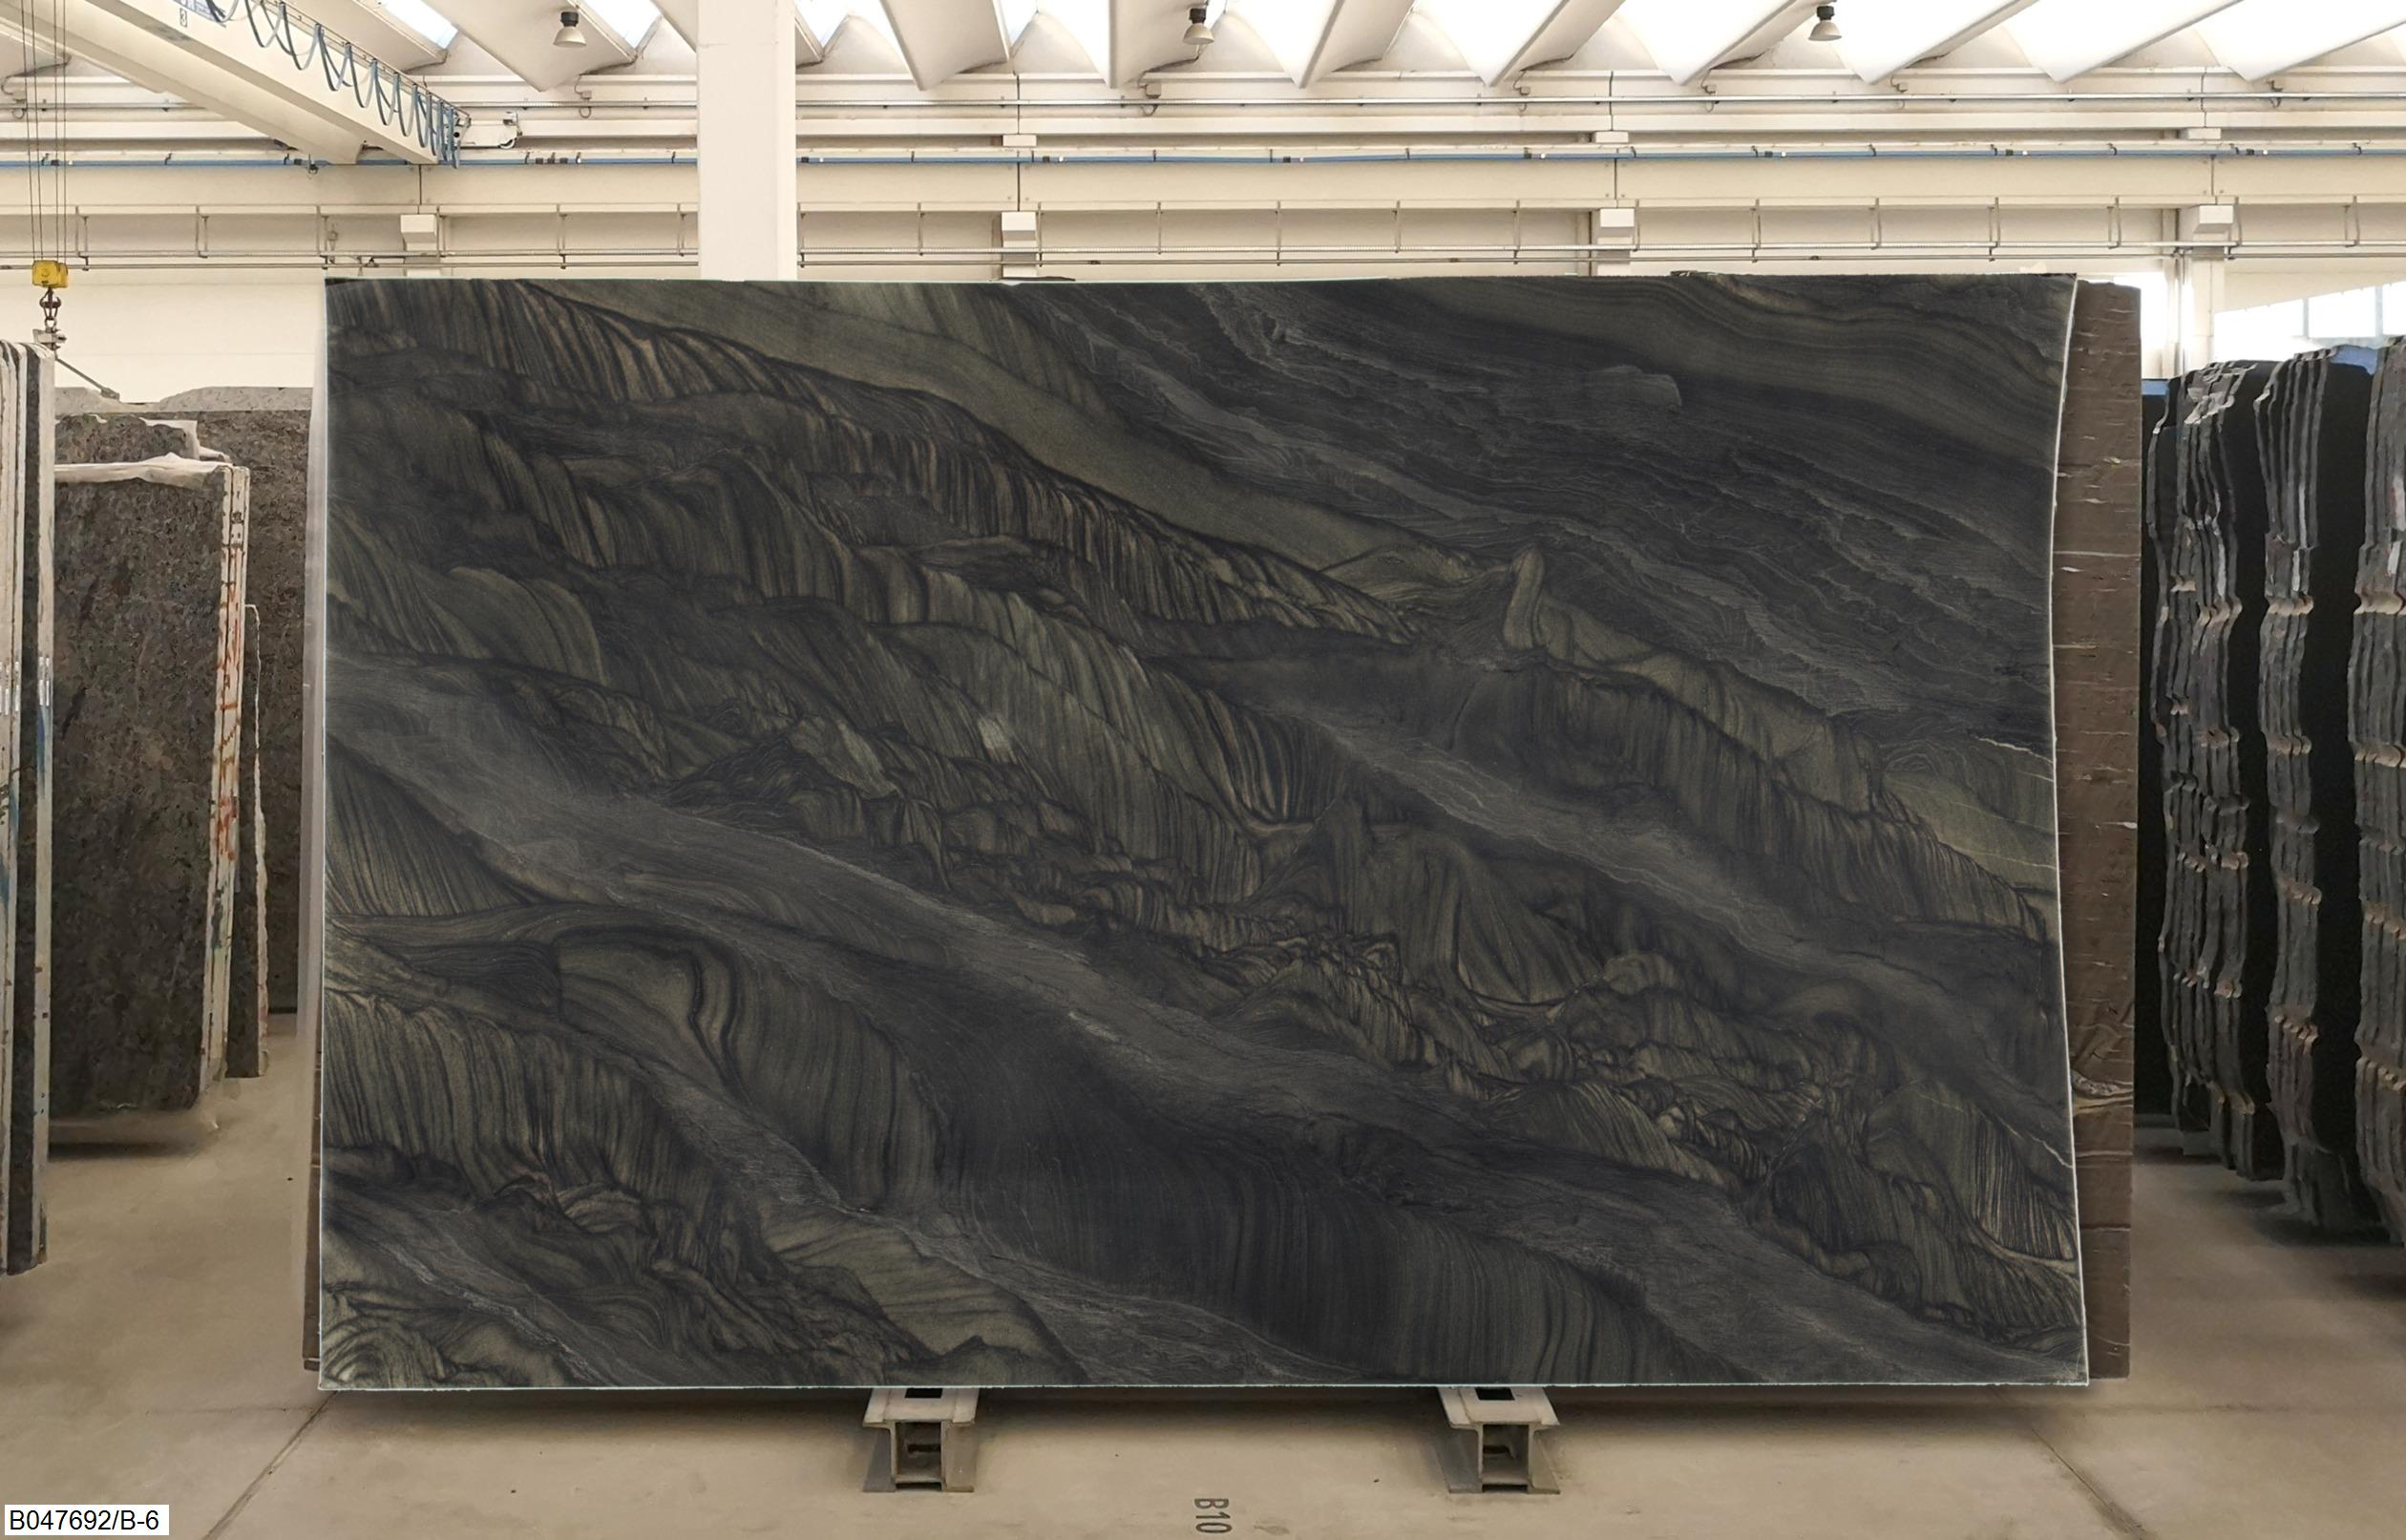 BLACK TEMPEST - LASTRE LUCIDE-MACCHIA APERTA Foto: 1_59157_39157.jpg